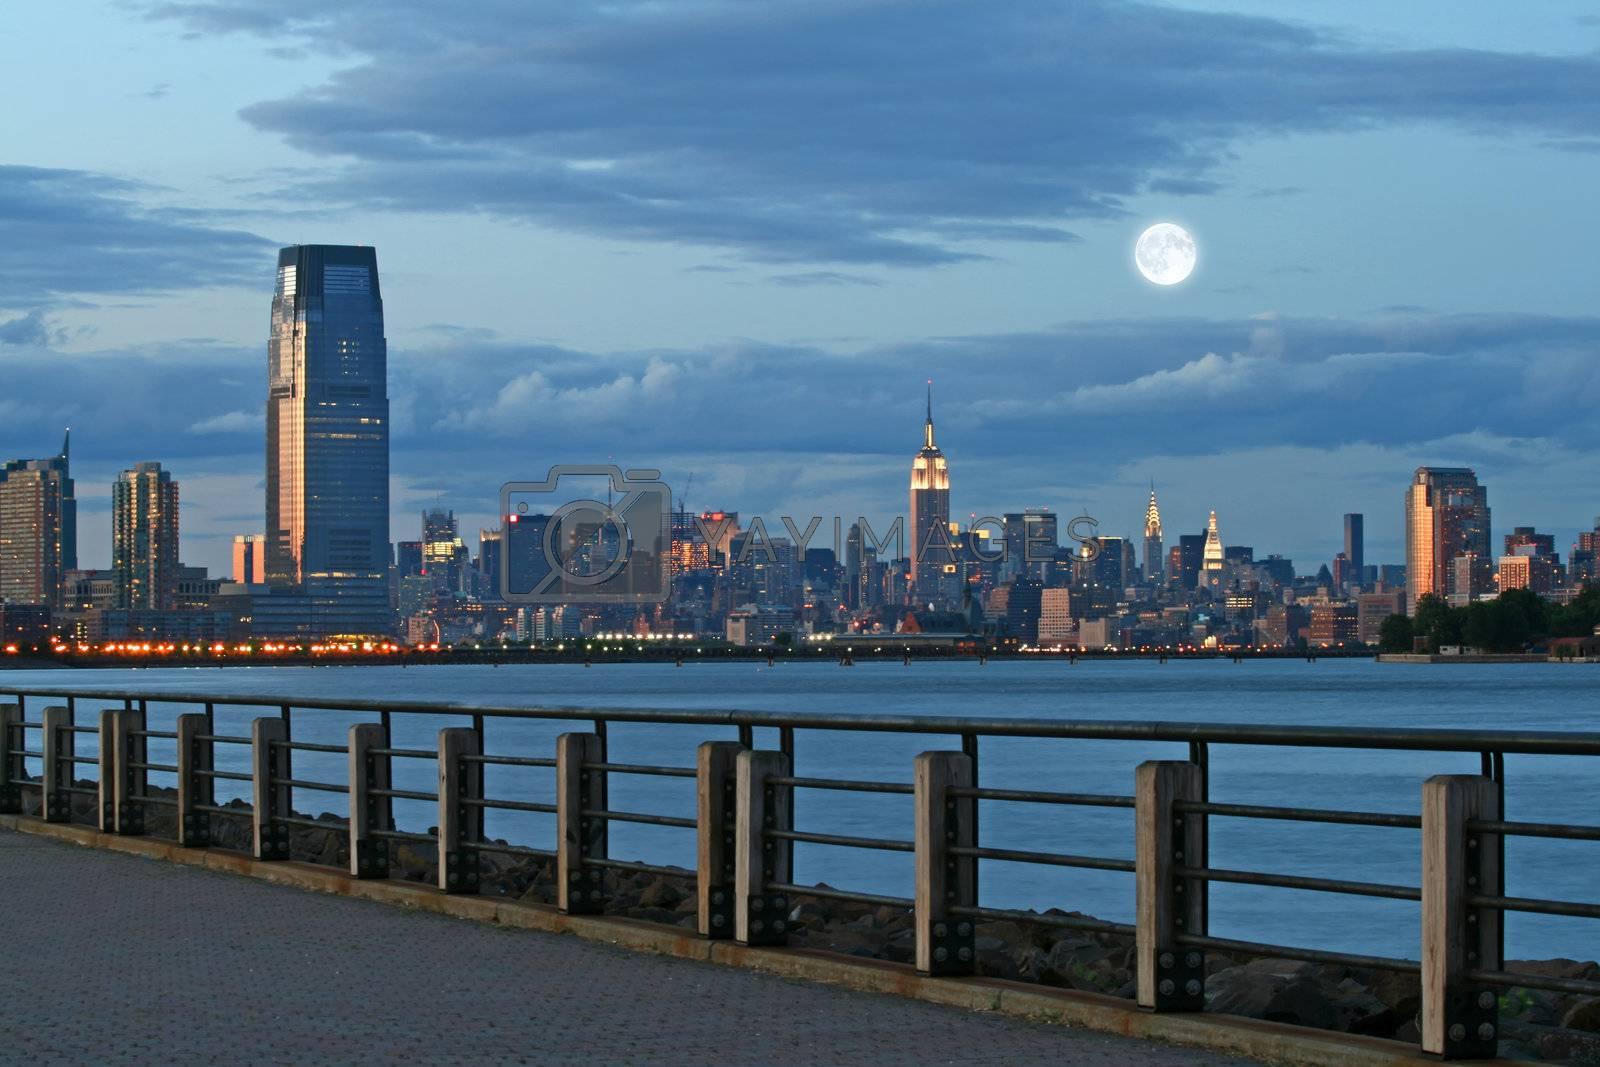 The Mid-town Manhattan Skyline in New York City